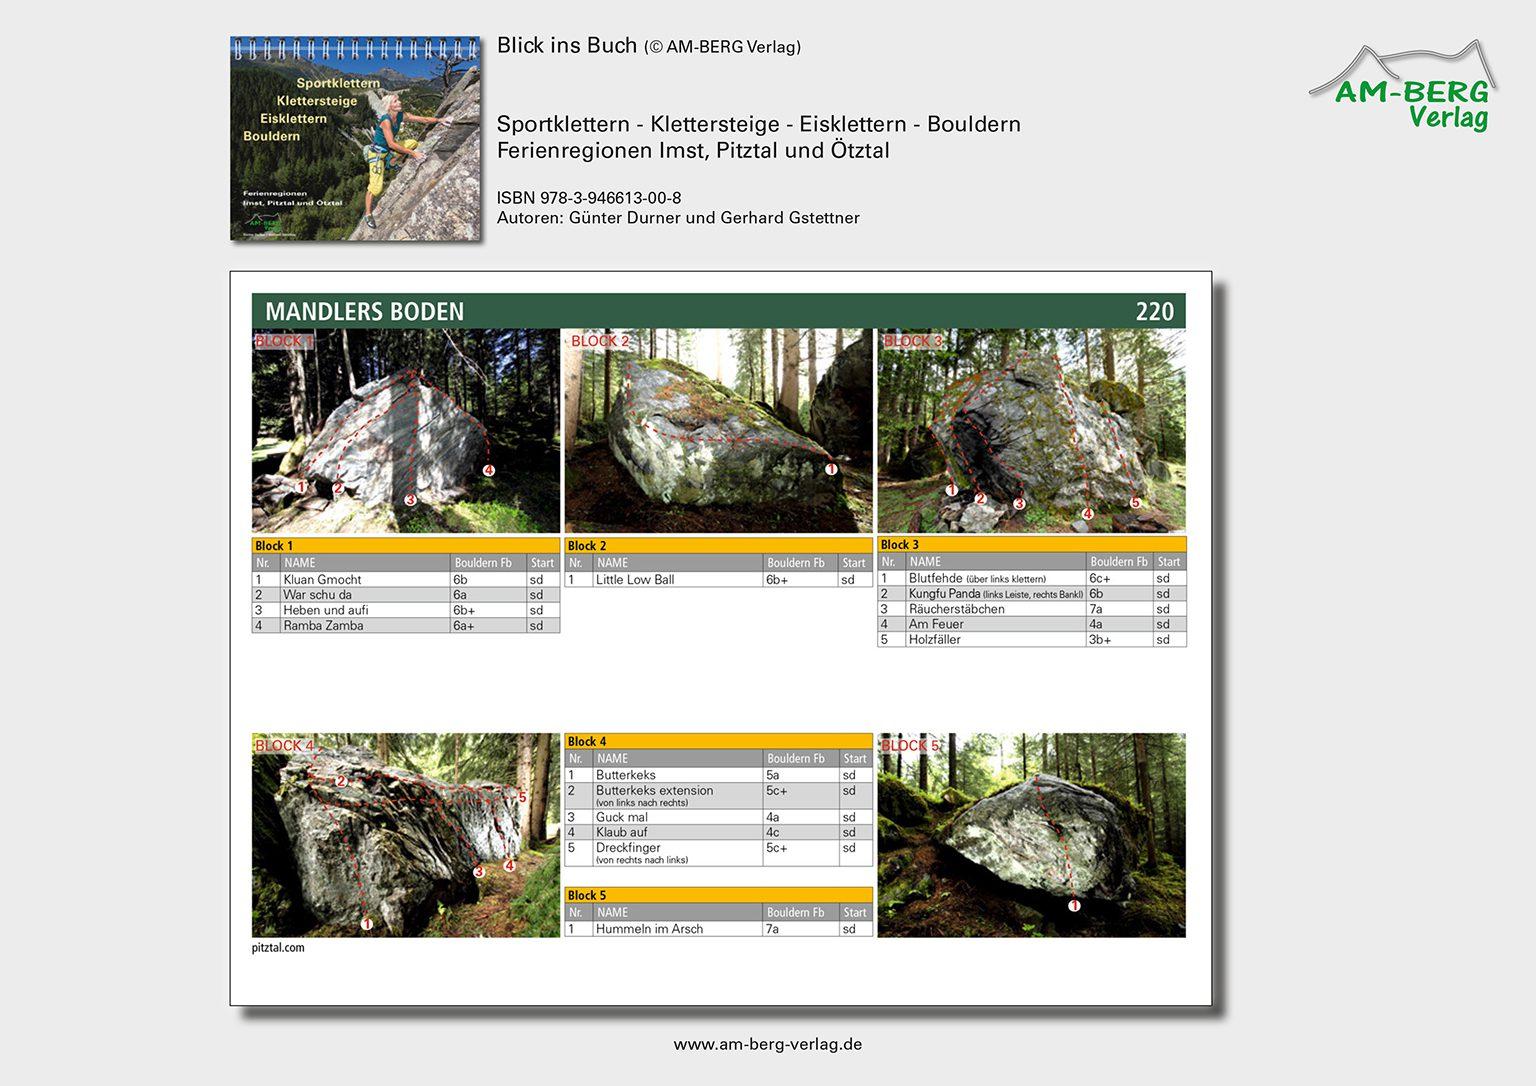 Sportklettern Imst-Pitztal-Ötztal_BlickinsBuch11_Bouldern-Mandlers-Boden